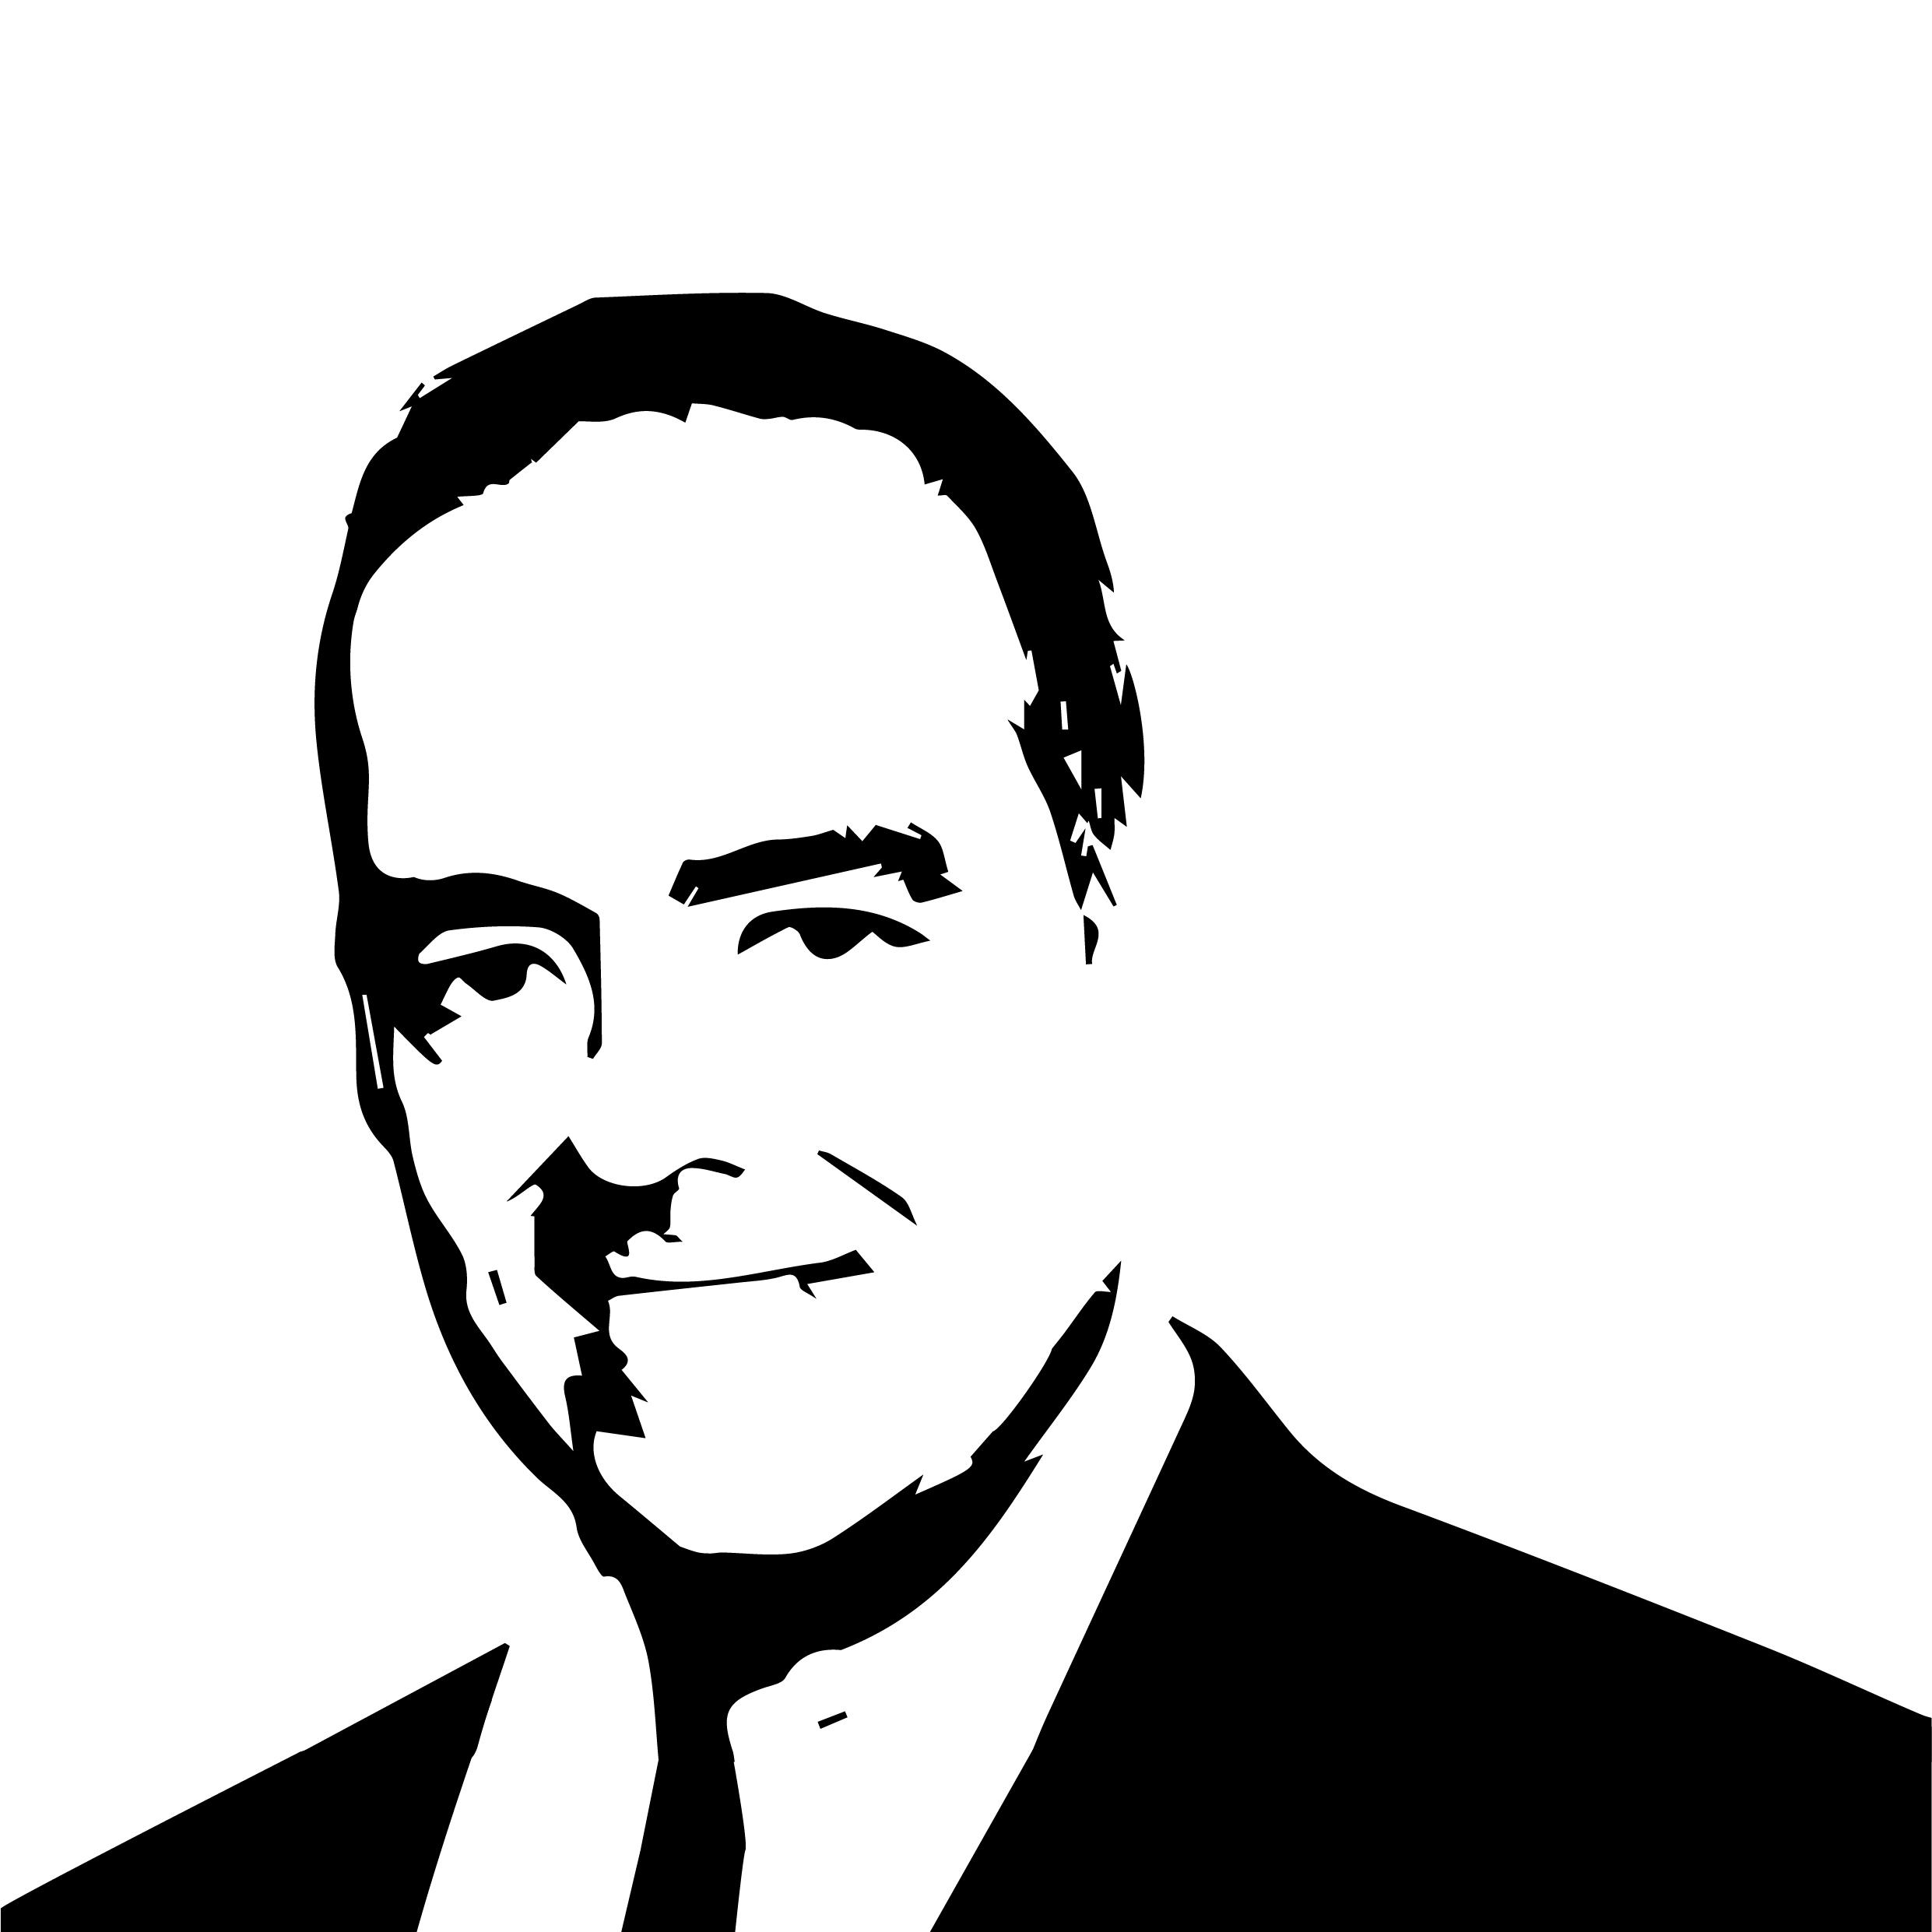 Sketch - Javier Rodríguez Zapatero